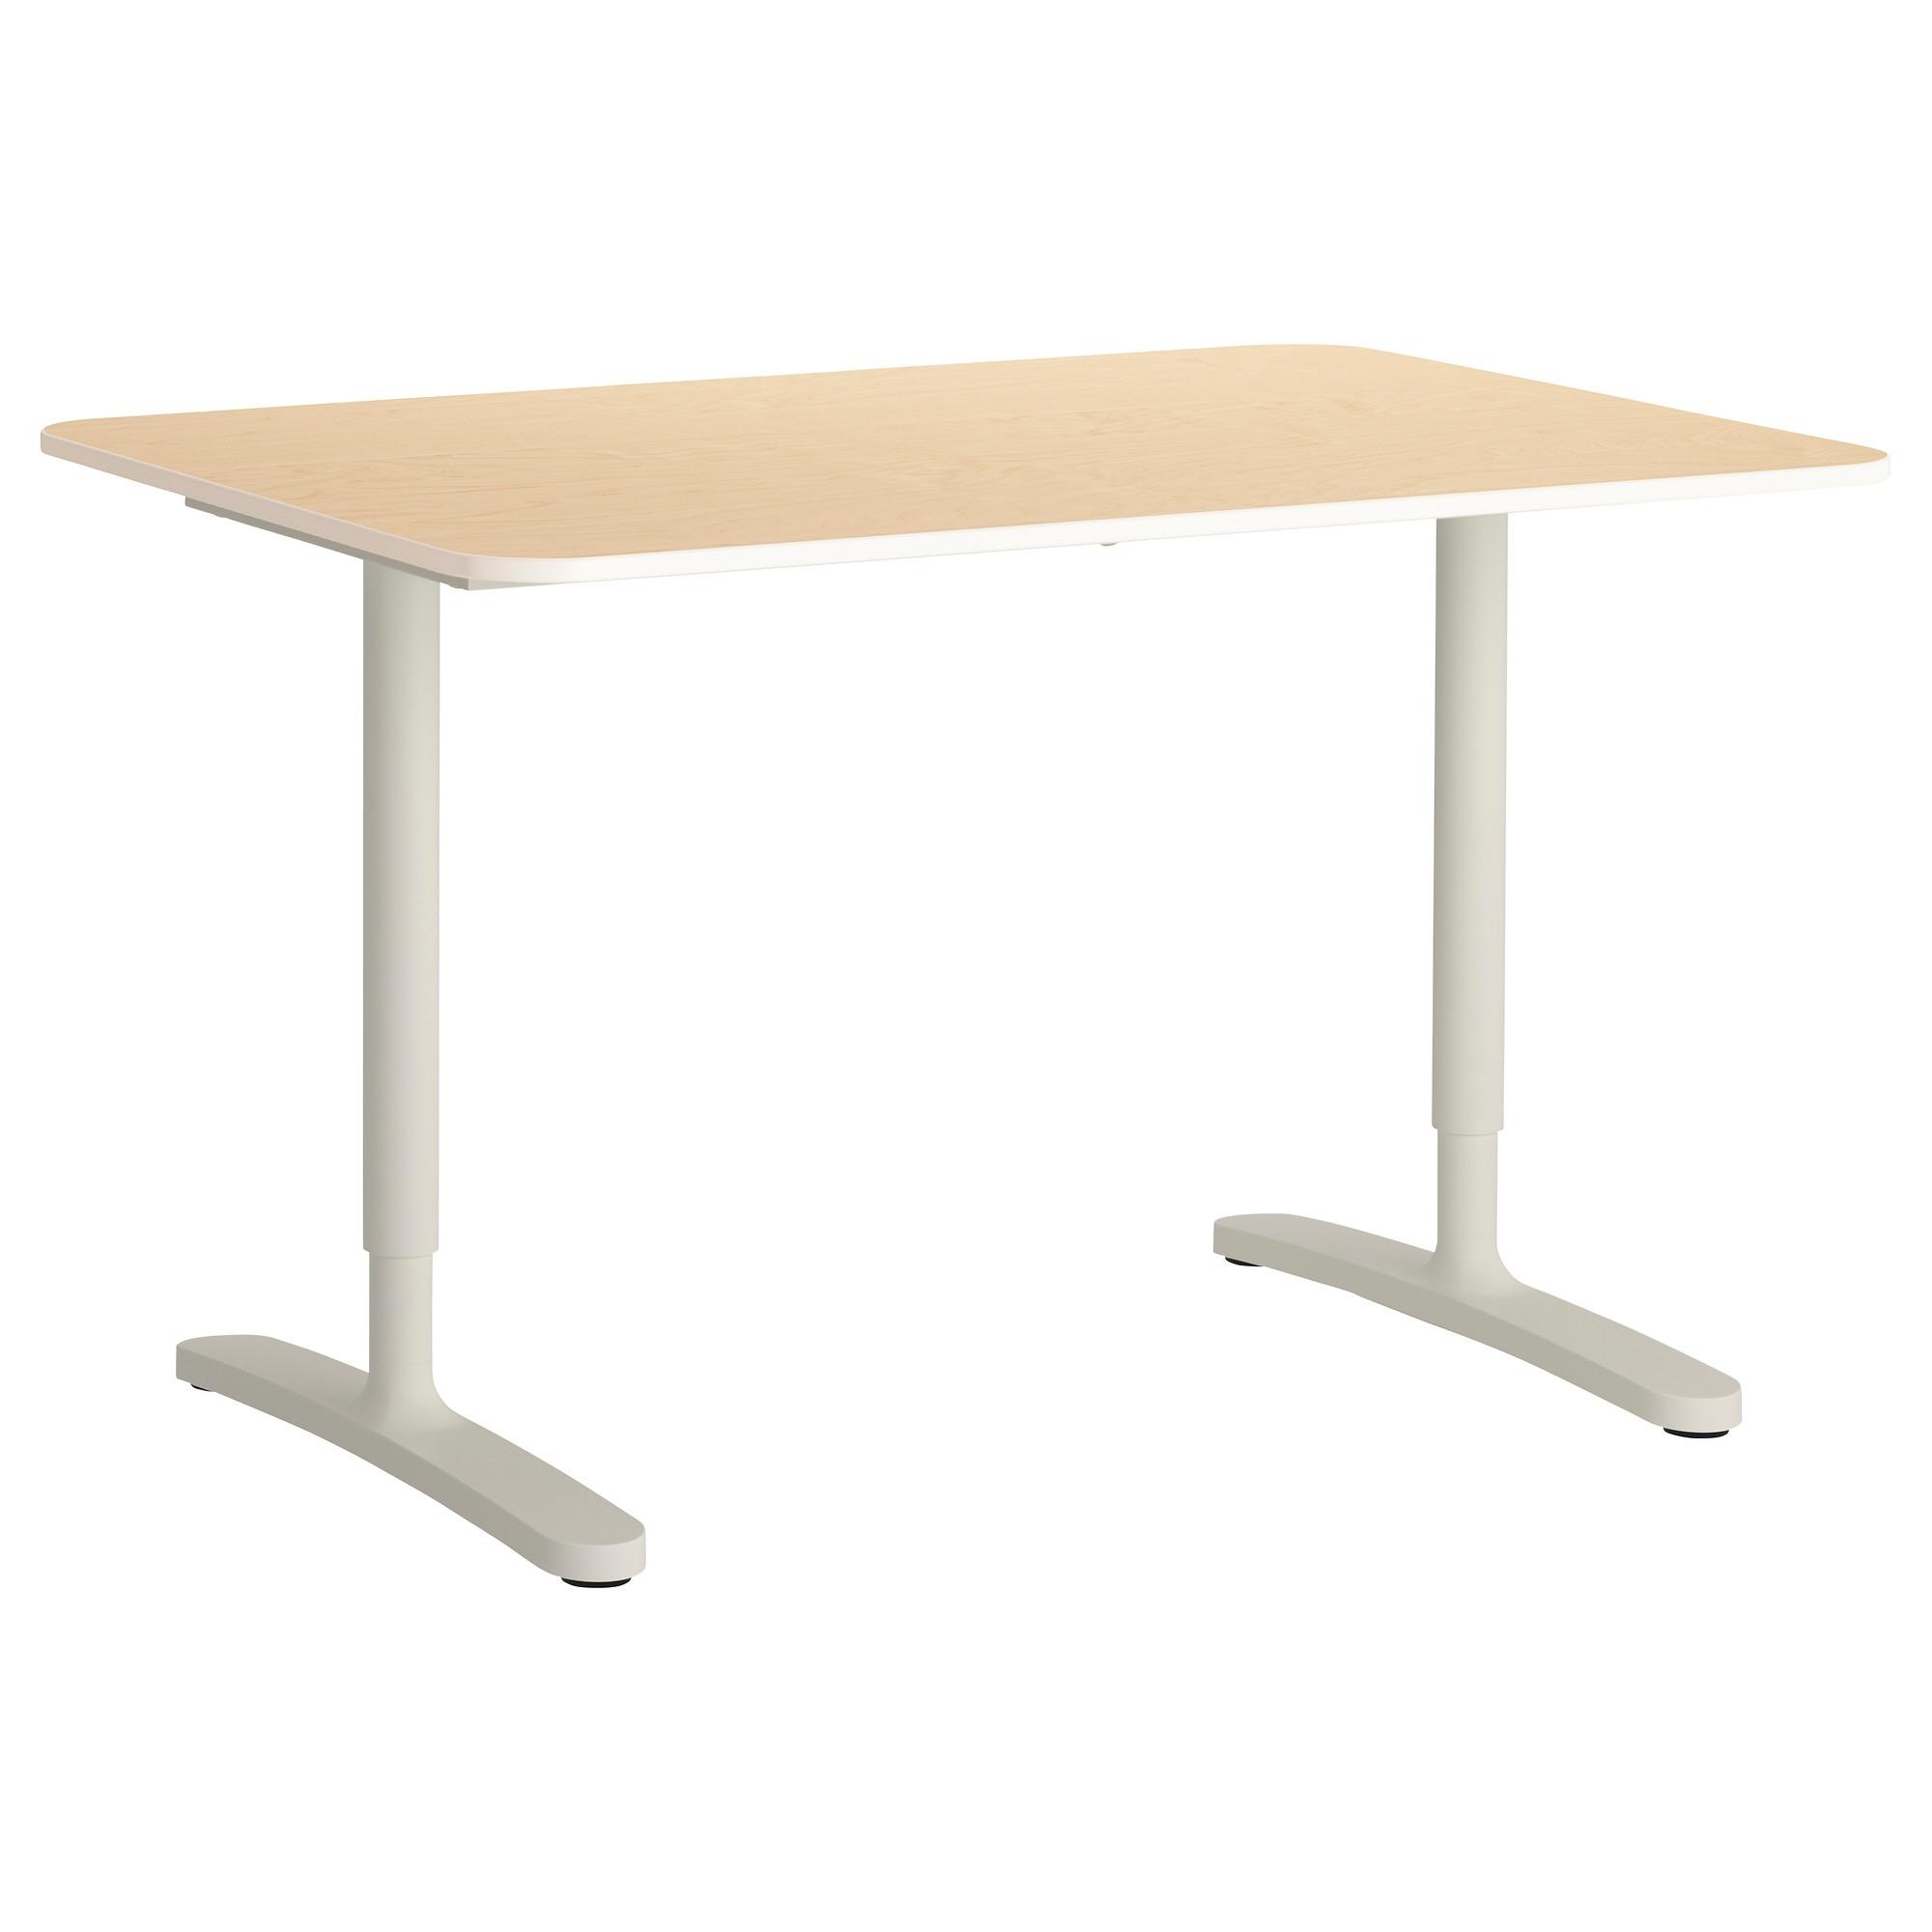 Ikea Mn Computer Desks Regarding Popular Bekant Desk – Black Brown/black – Ikea (Gallery 17 of 20)